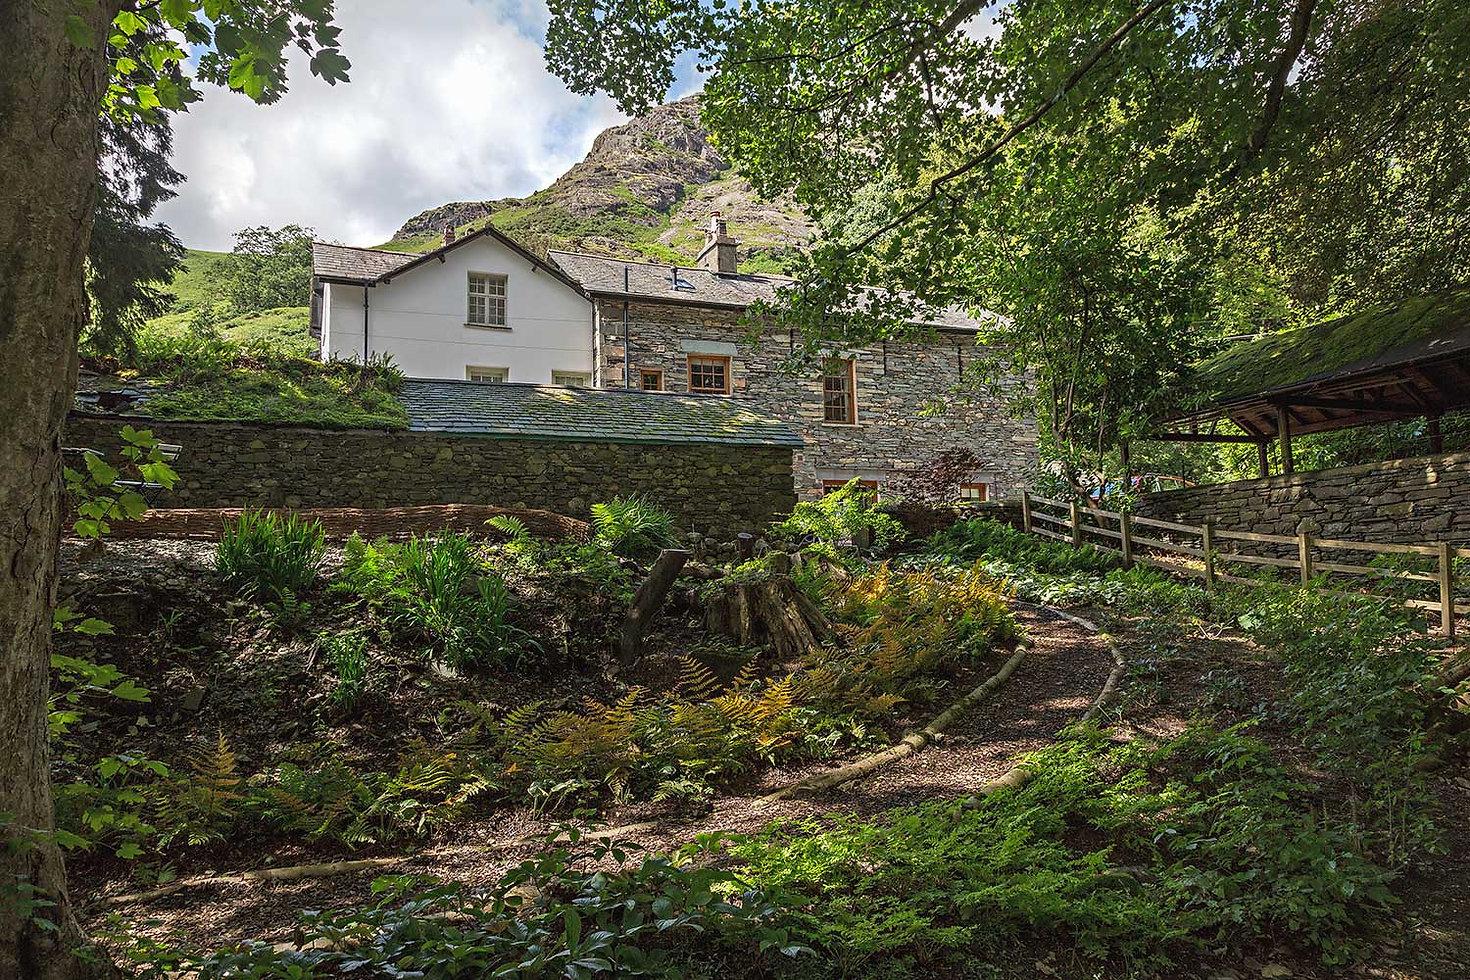 Coachman's House, Coniston, The Lake District